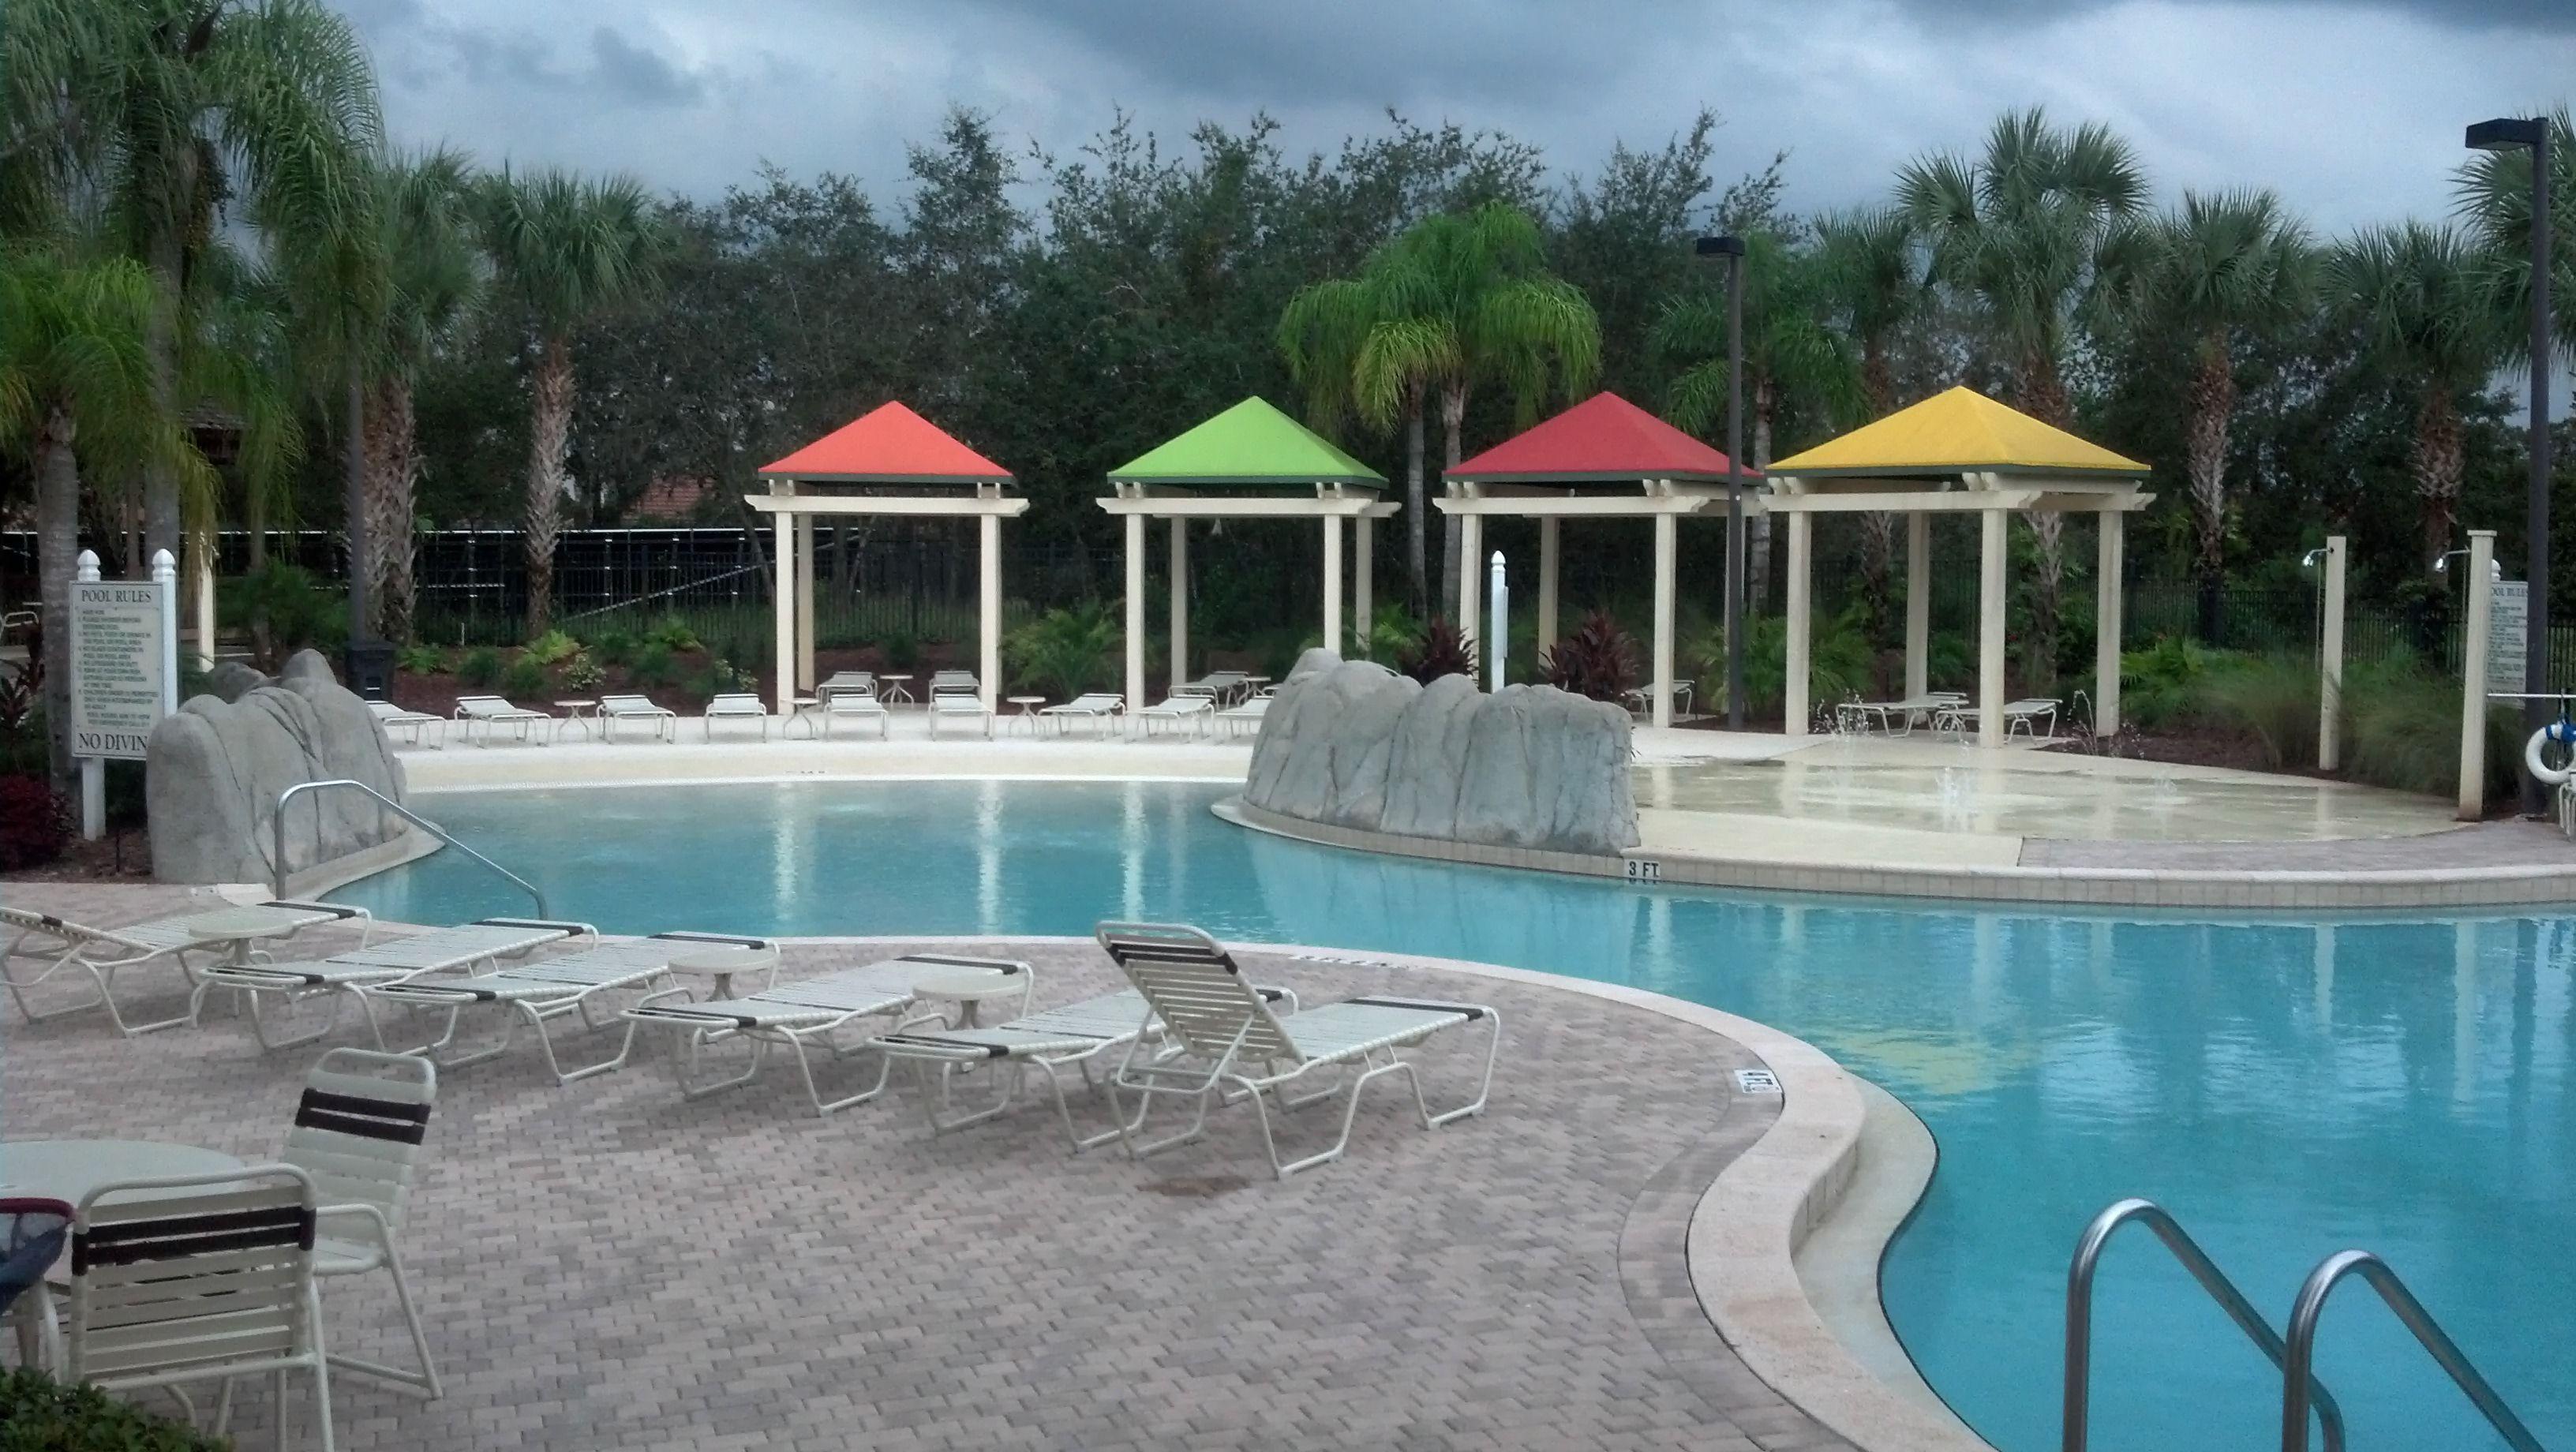 Pool Cabanas Florida Vacation Rentals Vacation Homes For Rent Vacation Home